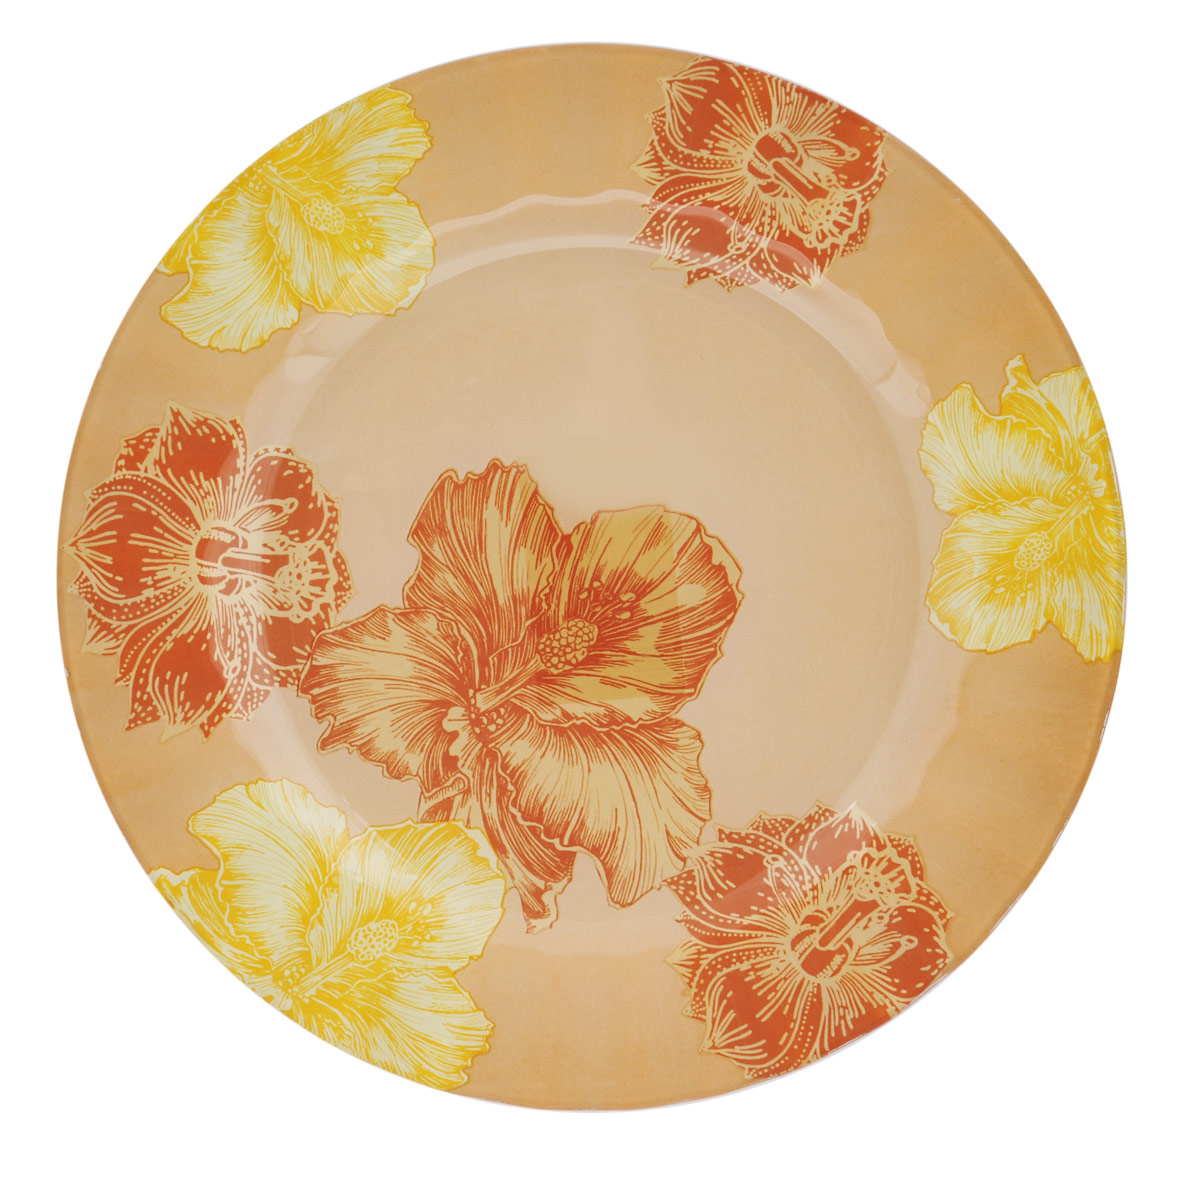 Тарелка House & Holder Цветы, диаметр 25 см. S3010EG008 полуприцеп маз 975800 3010 2012 г в